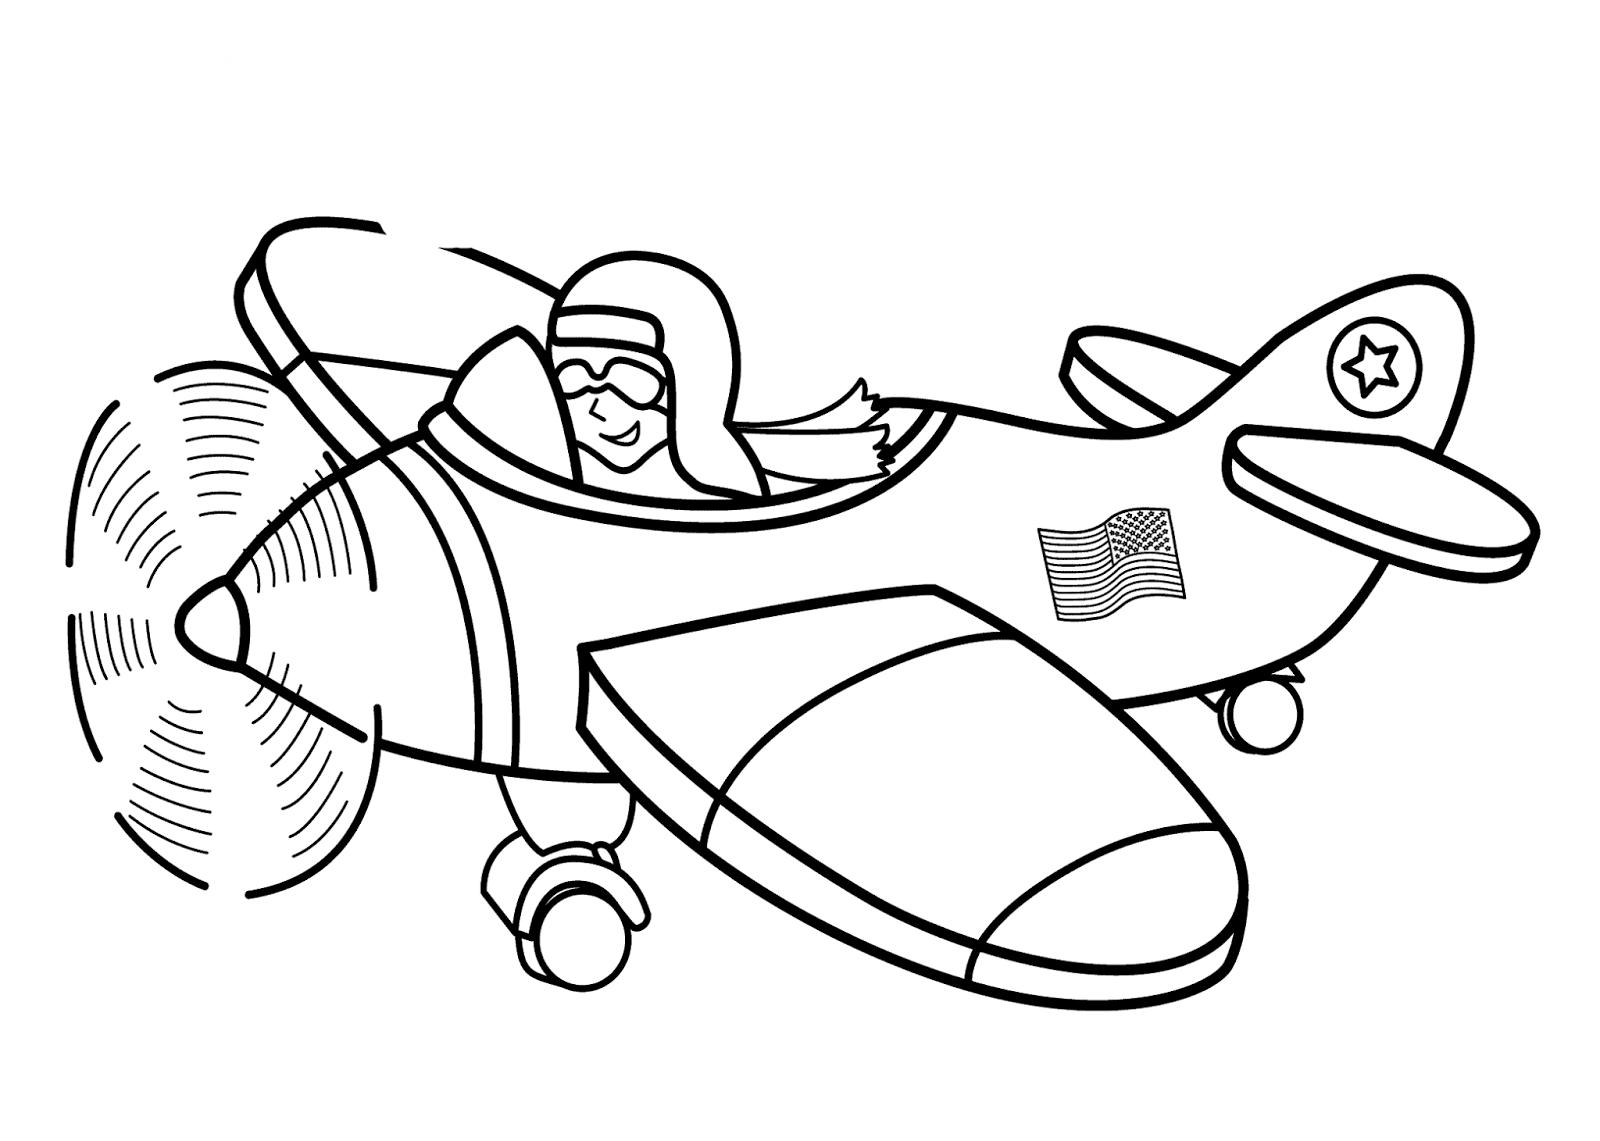 Pilot Hat Coloring Page Coloring Pages